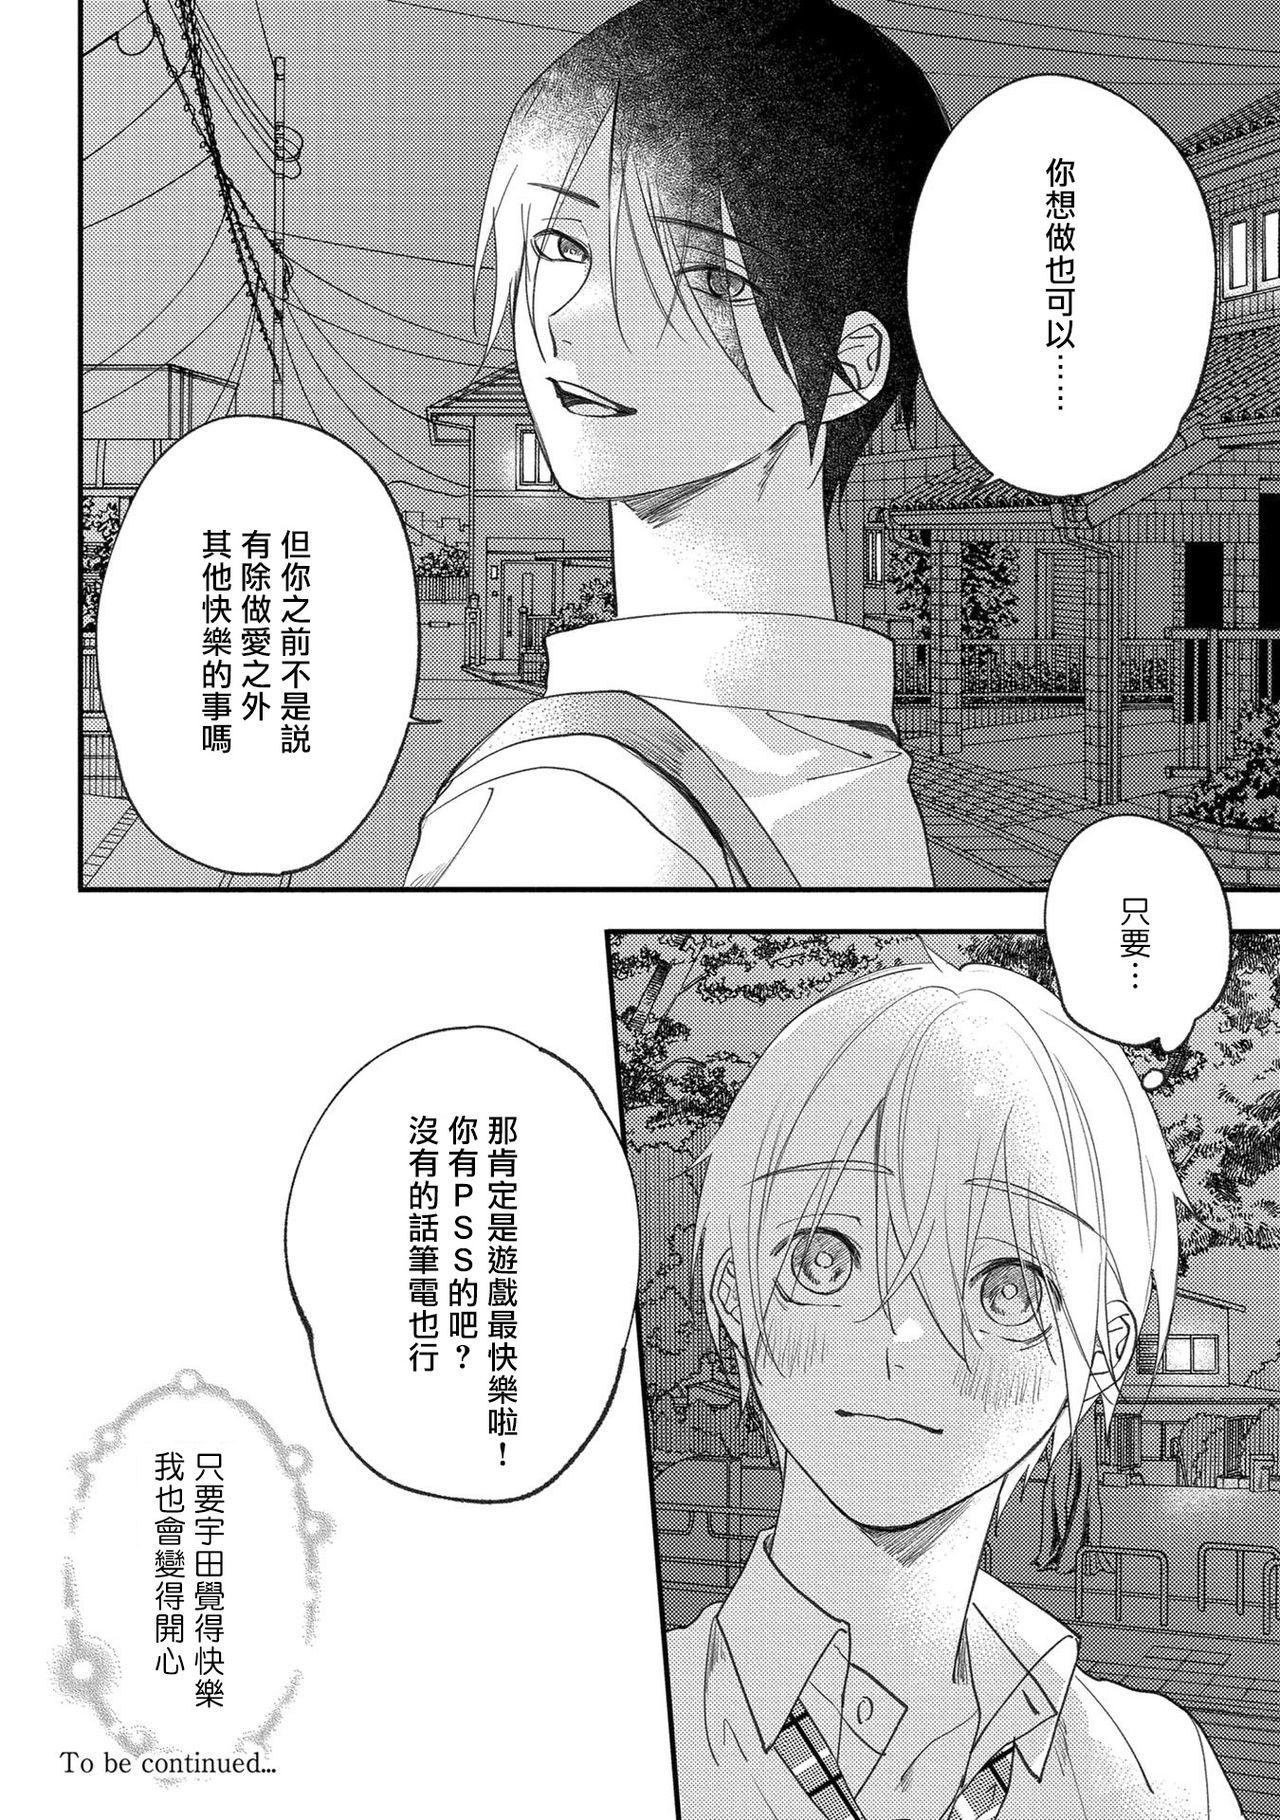 [Utata Hakuto] Houkago Virginity - Virginity afterschool 1-5 完结 [Chinese] [拾荒者汉化组] [Digital] 132